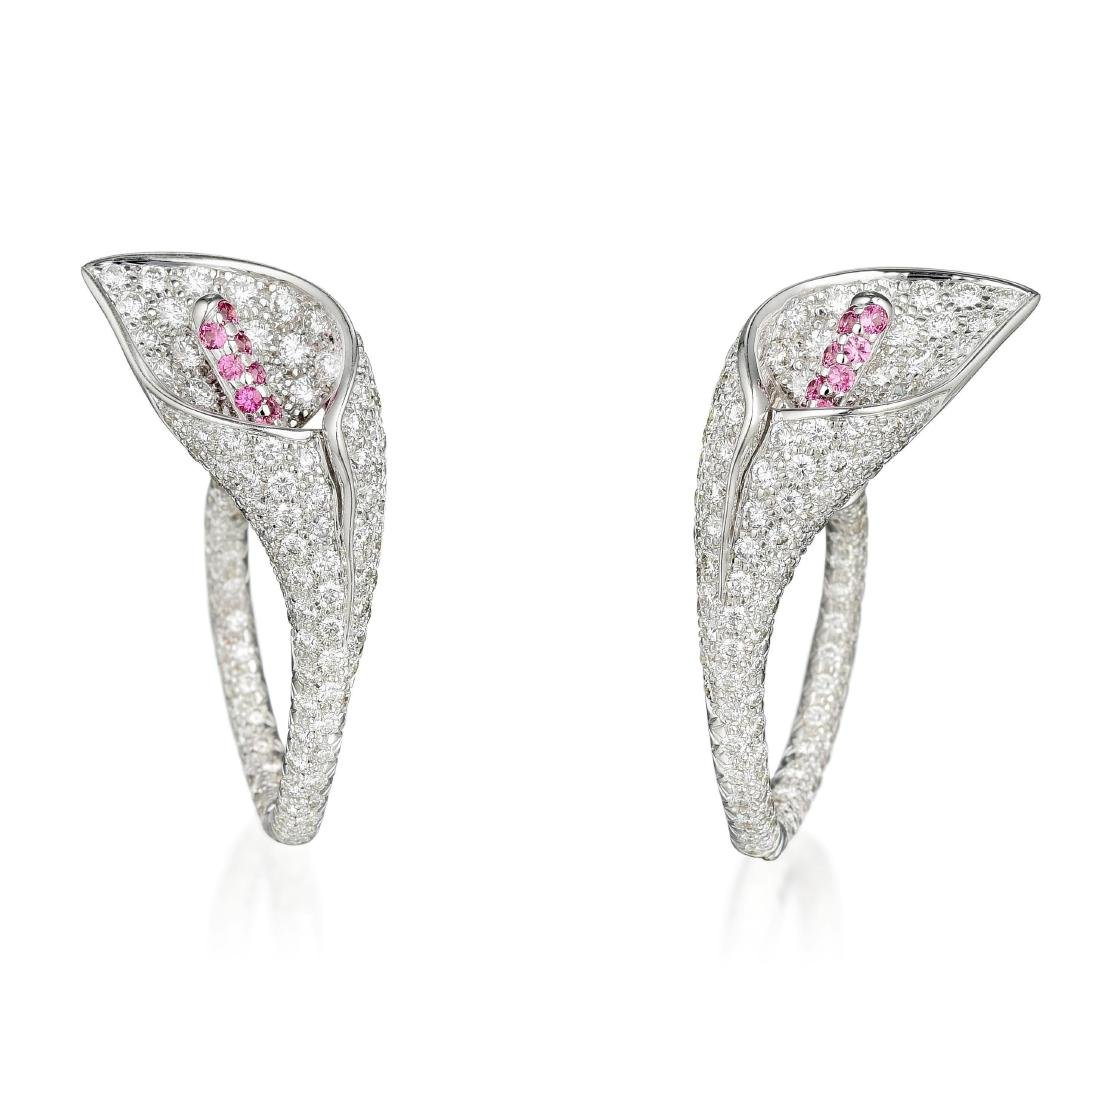 Asprey Diamond and Pink Sapphire Calla Lily Earrings